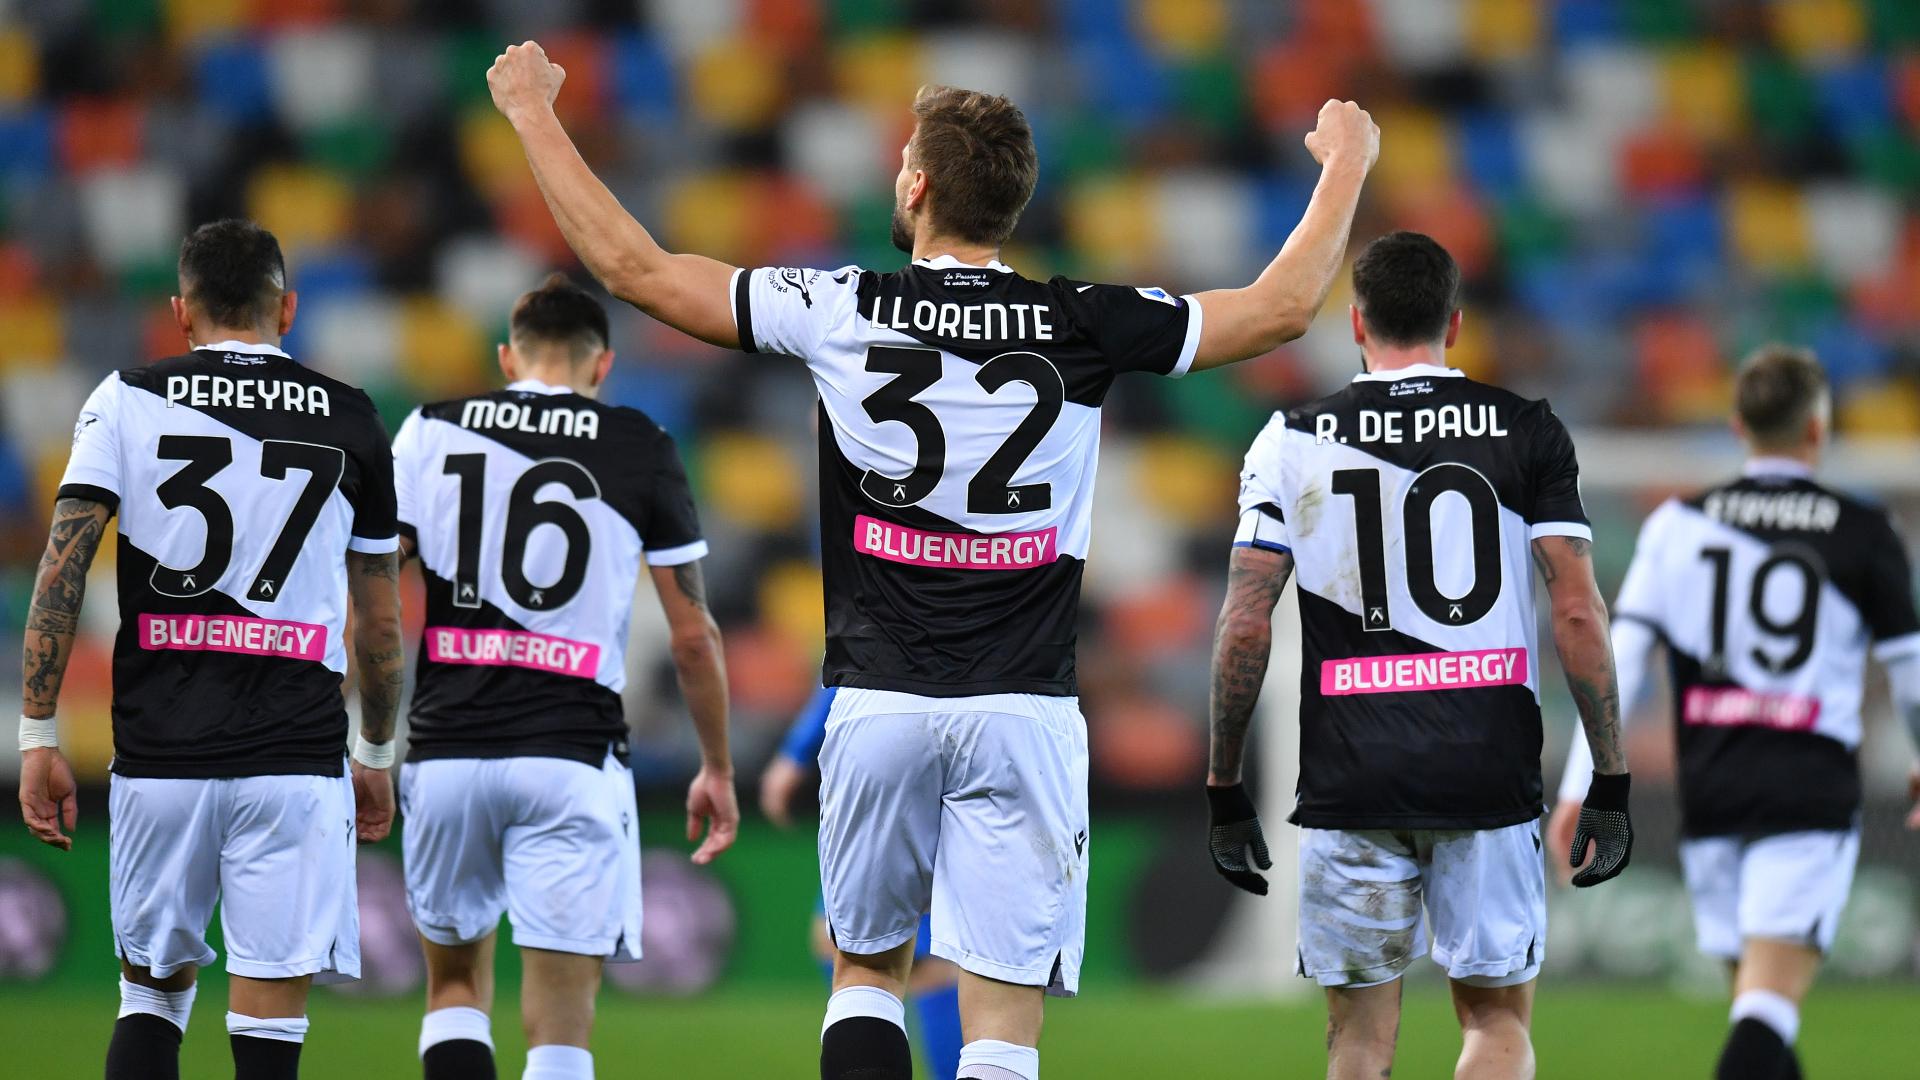 Udinese-Sassuolo 2-0: Llorente-Pereyra, i friulani ora volano